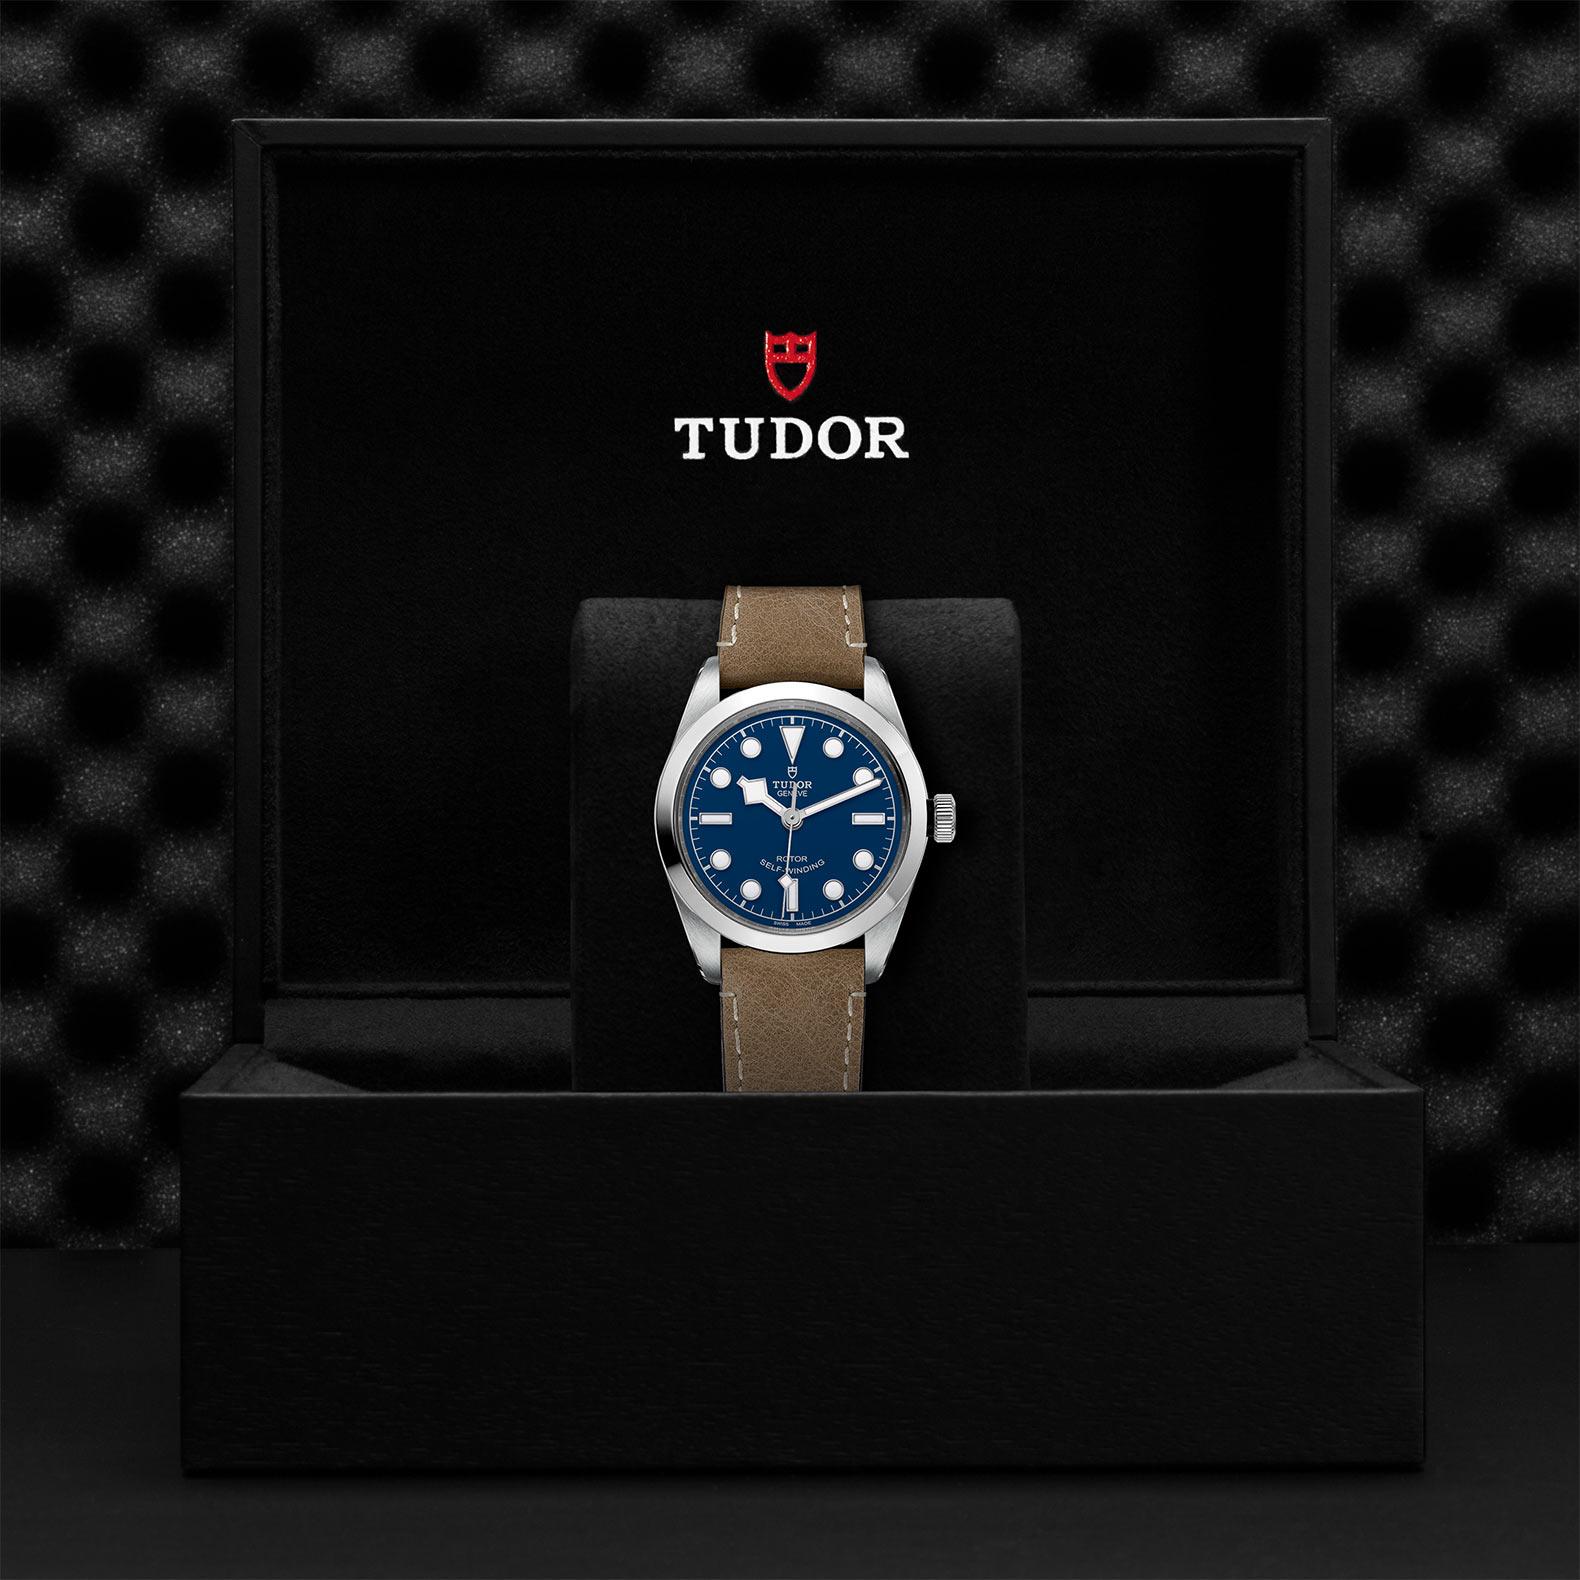 TUDOR Black Bay 36 M79500 0005 Presentation